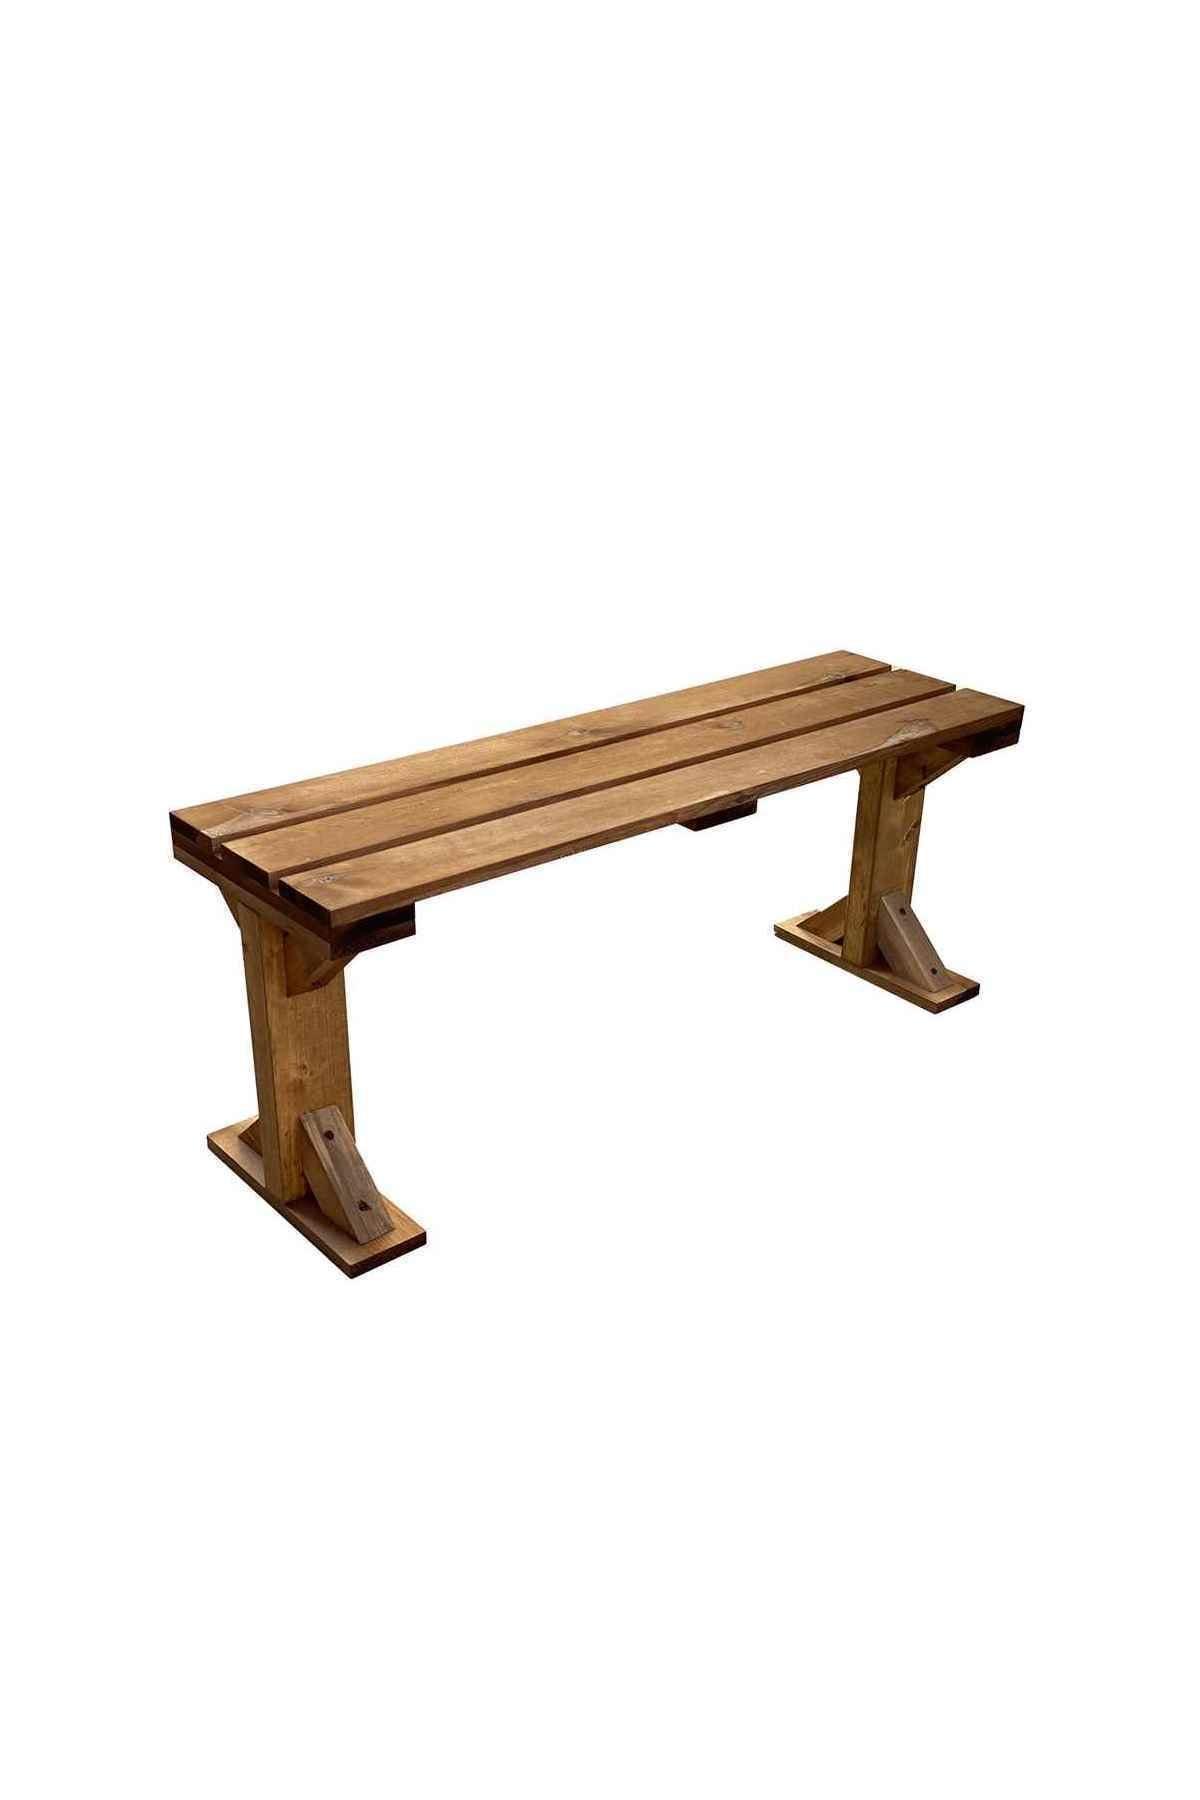 Weblonya Bank Ahşap Bench Sandalye Mutfak Bank 5140 1